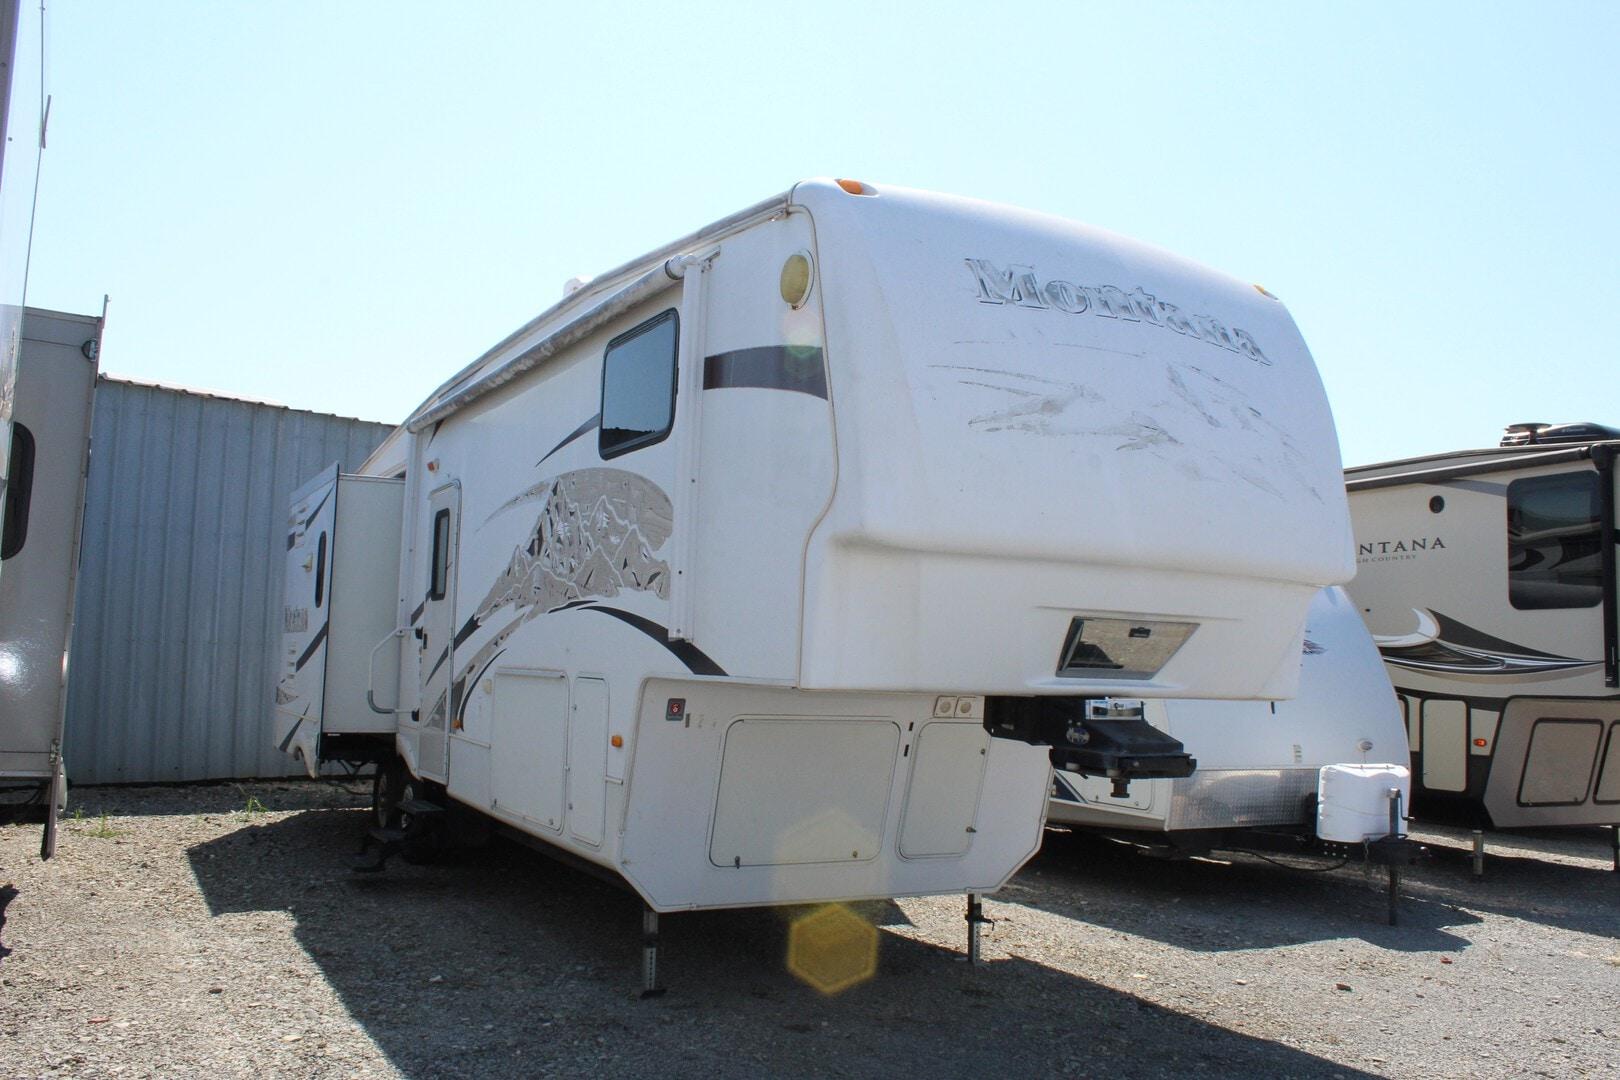 Used, 2009, Keystone, Montana 3075RL, Fifth Wheels